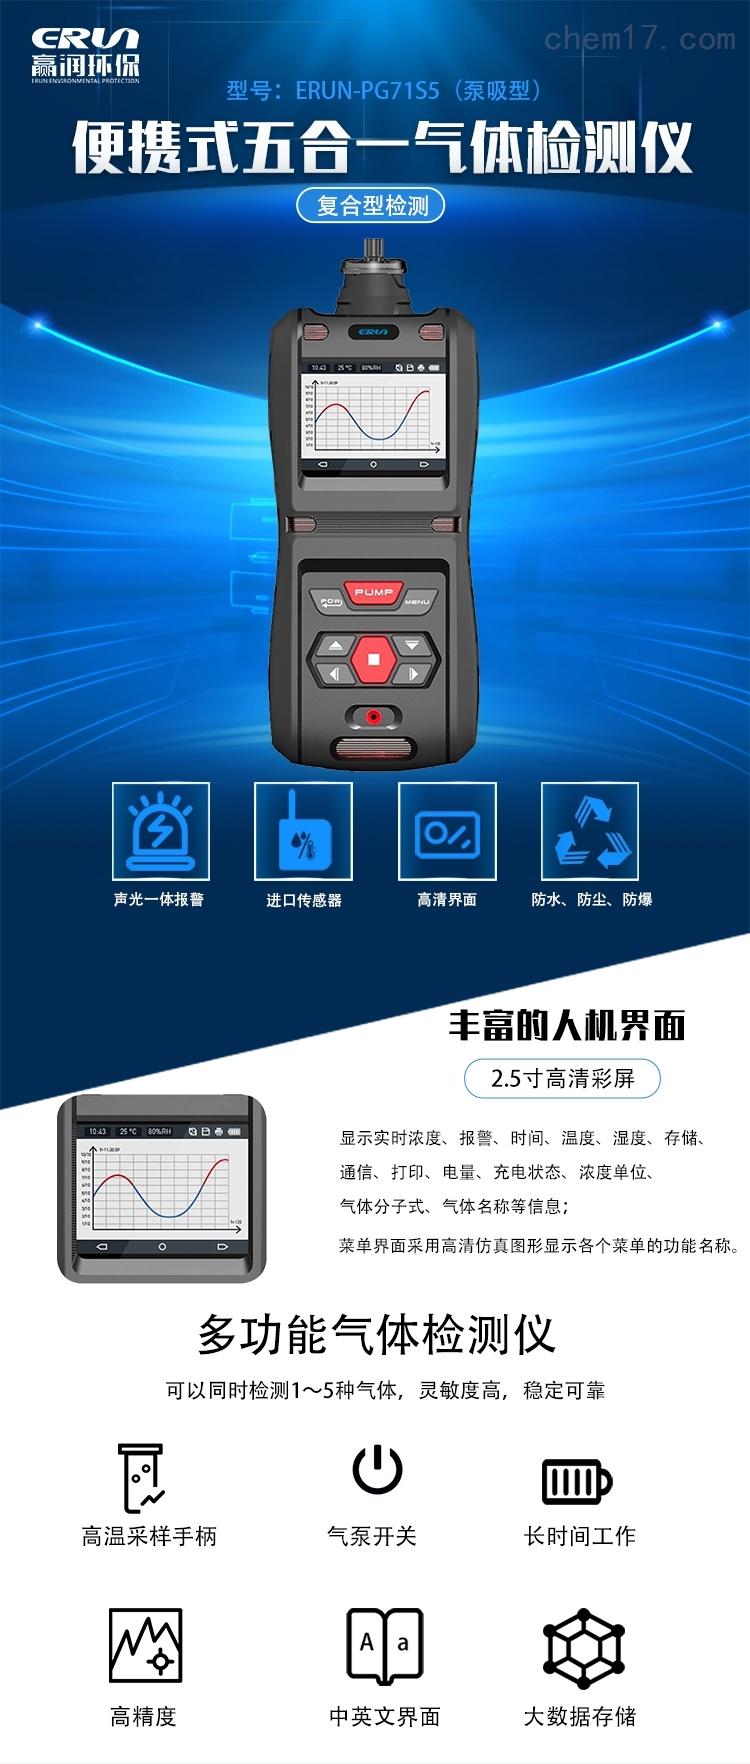 <strong>便携式乙烯气体检测仪</strong>